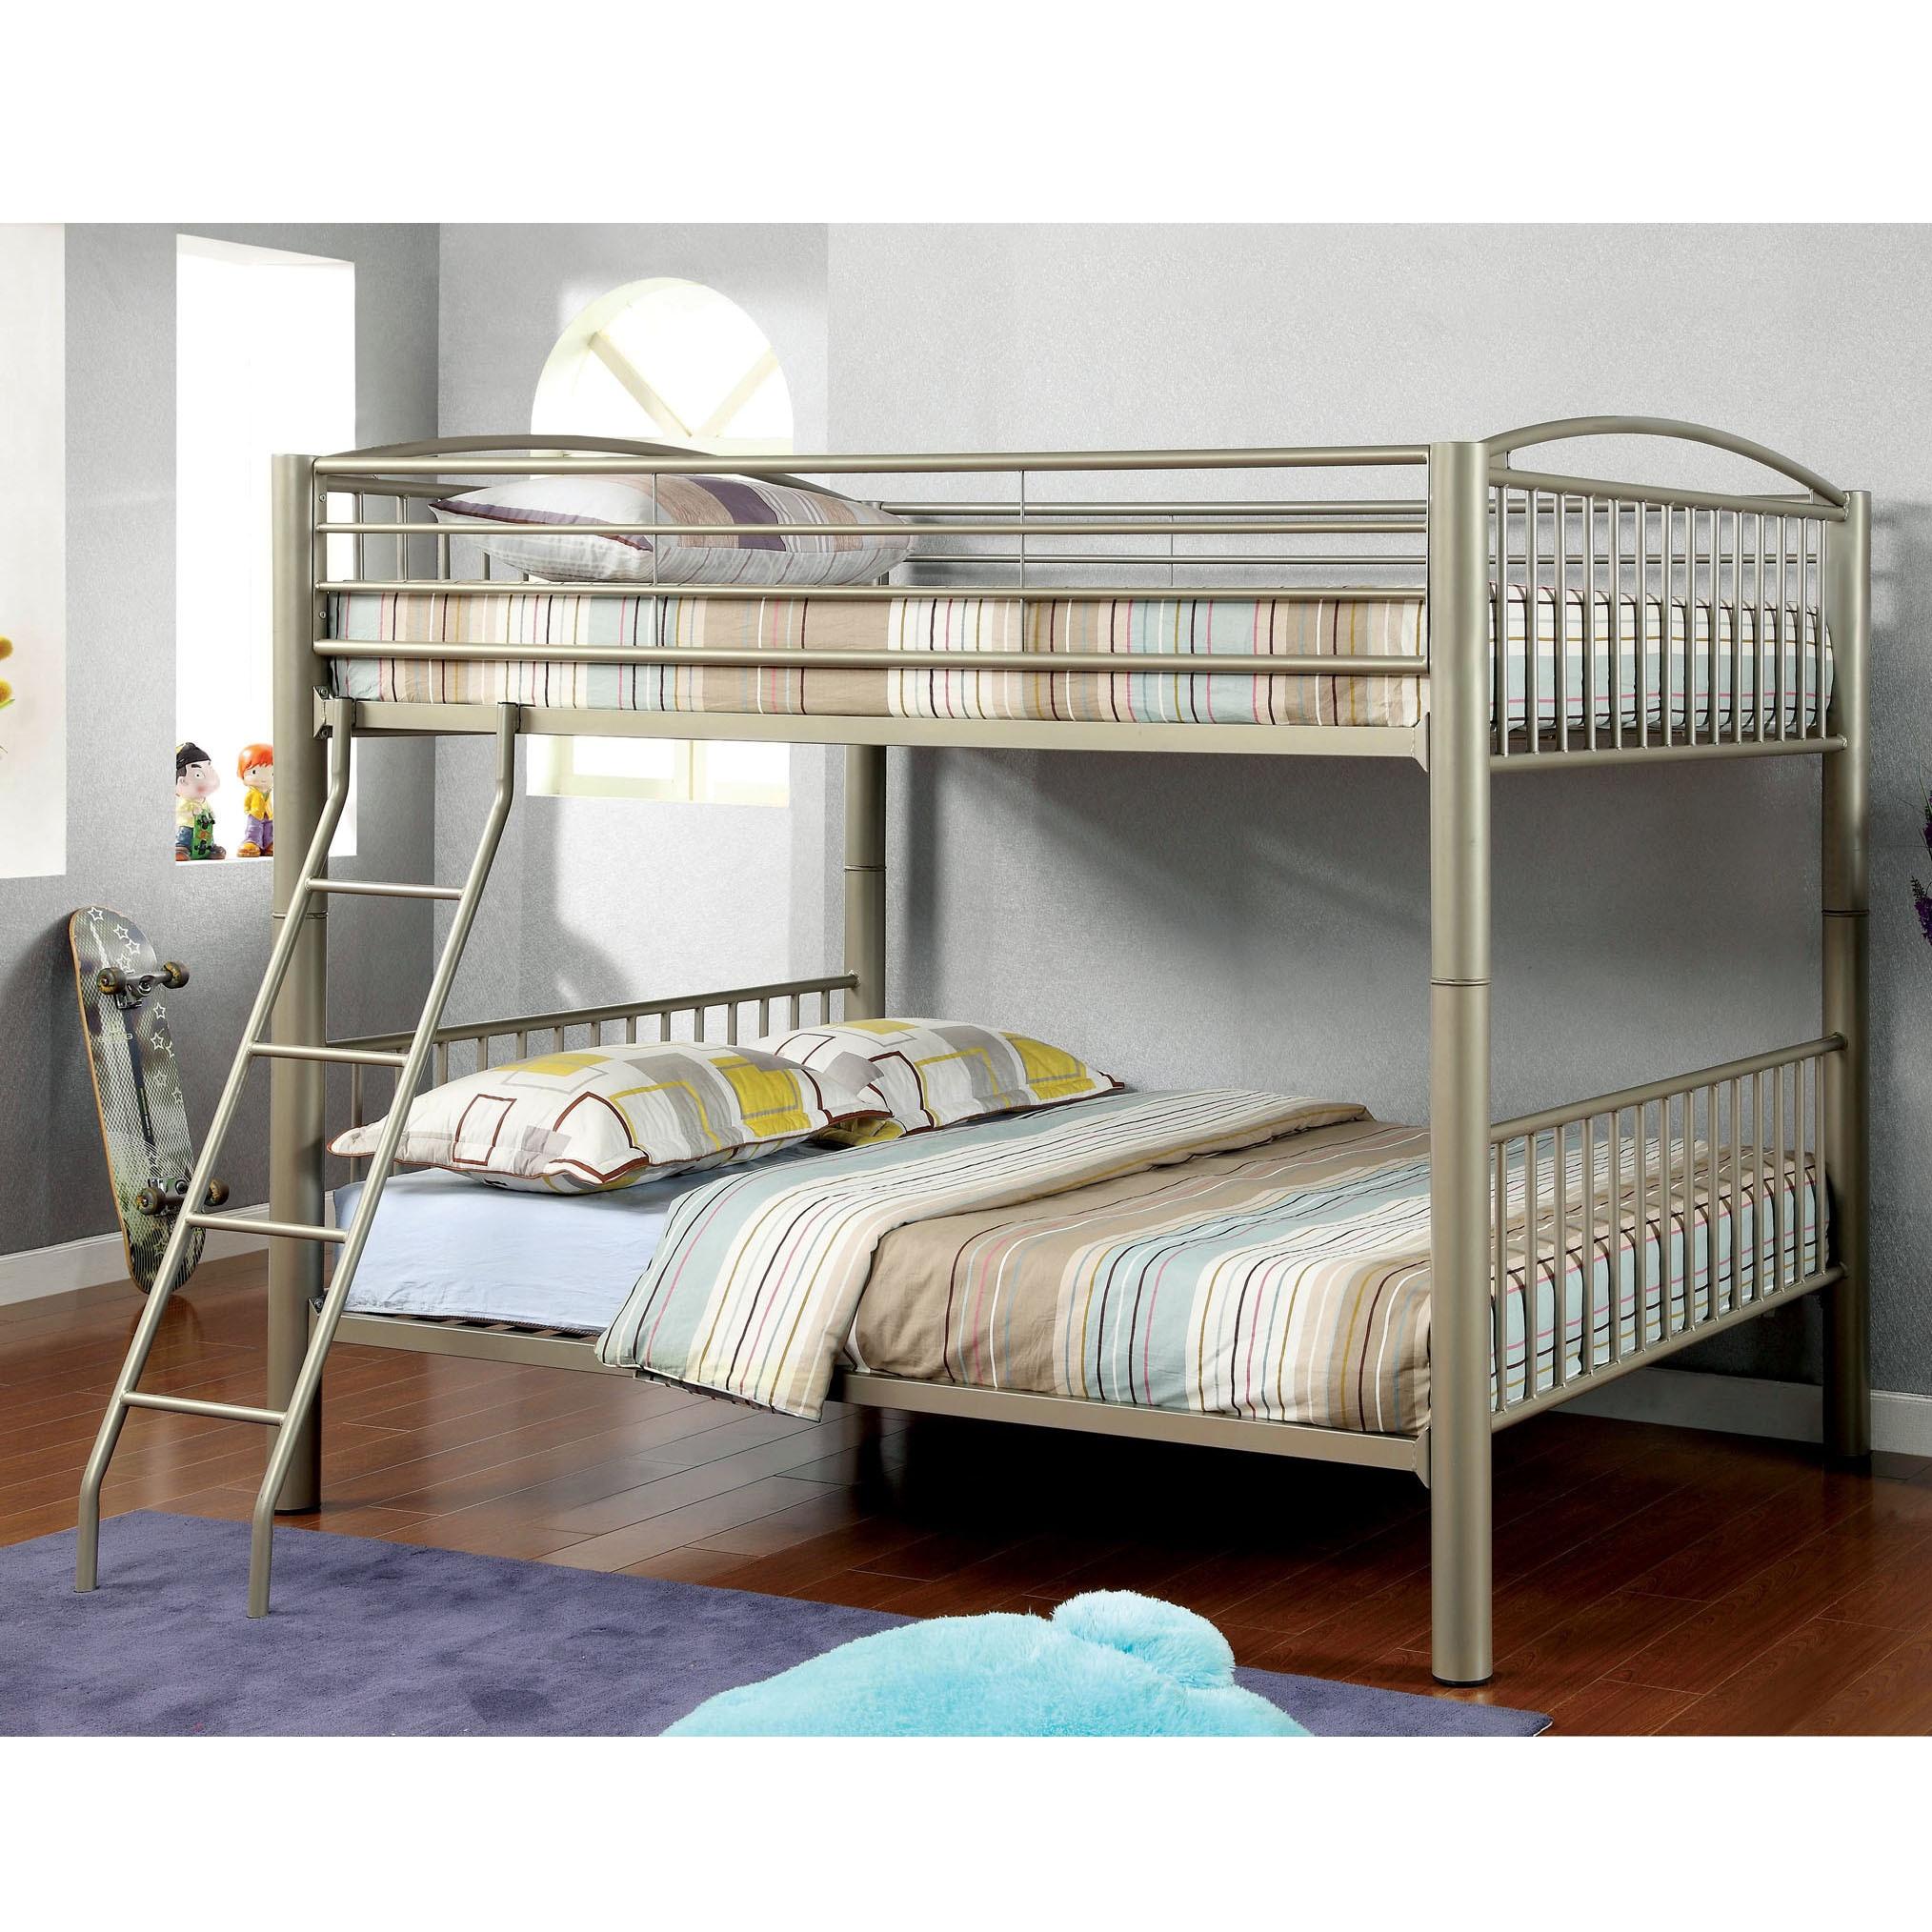 Furniture of America Olivane Modern Metallic Gold Full-Fu...